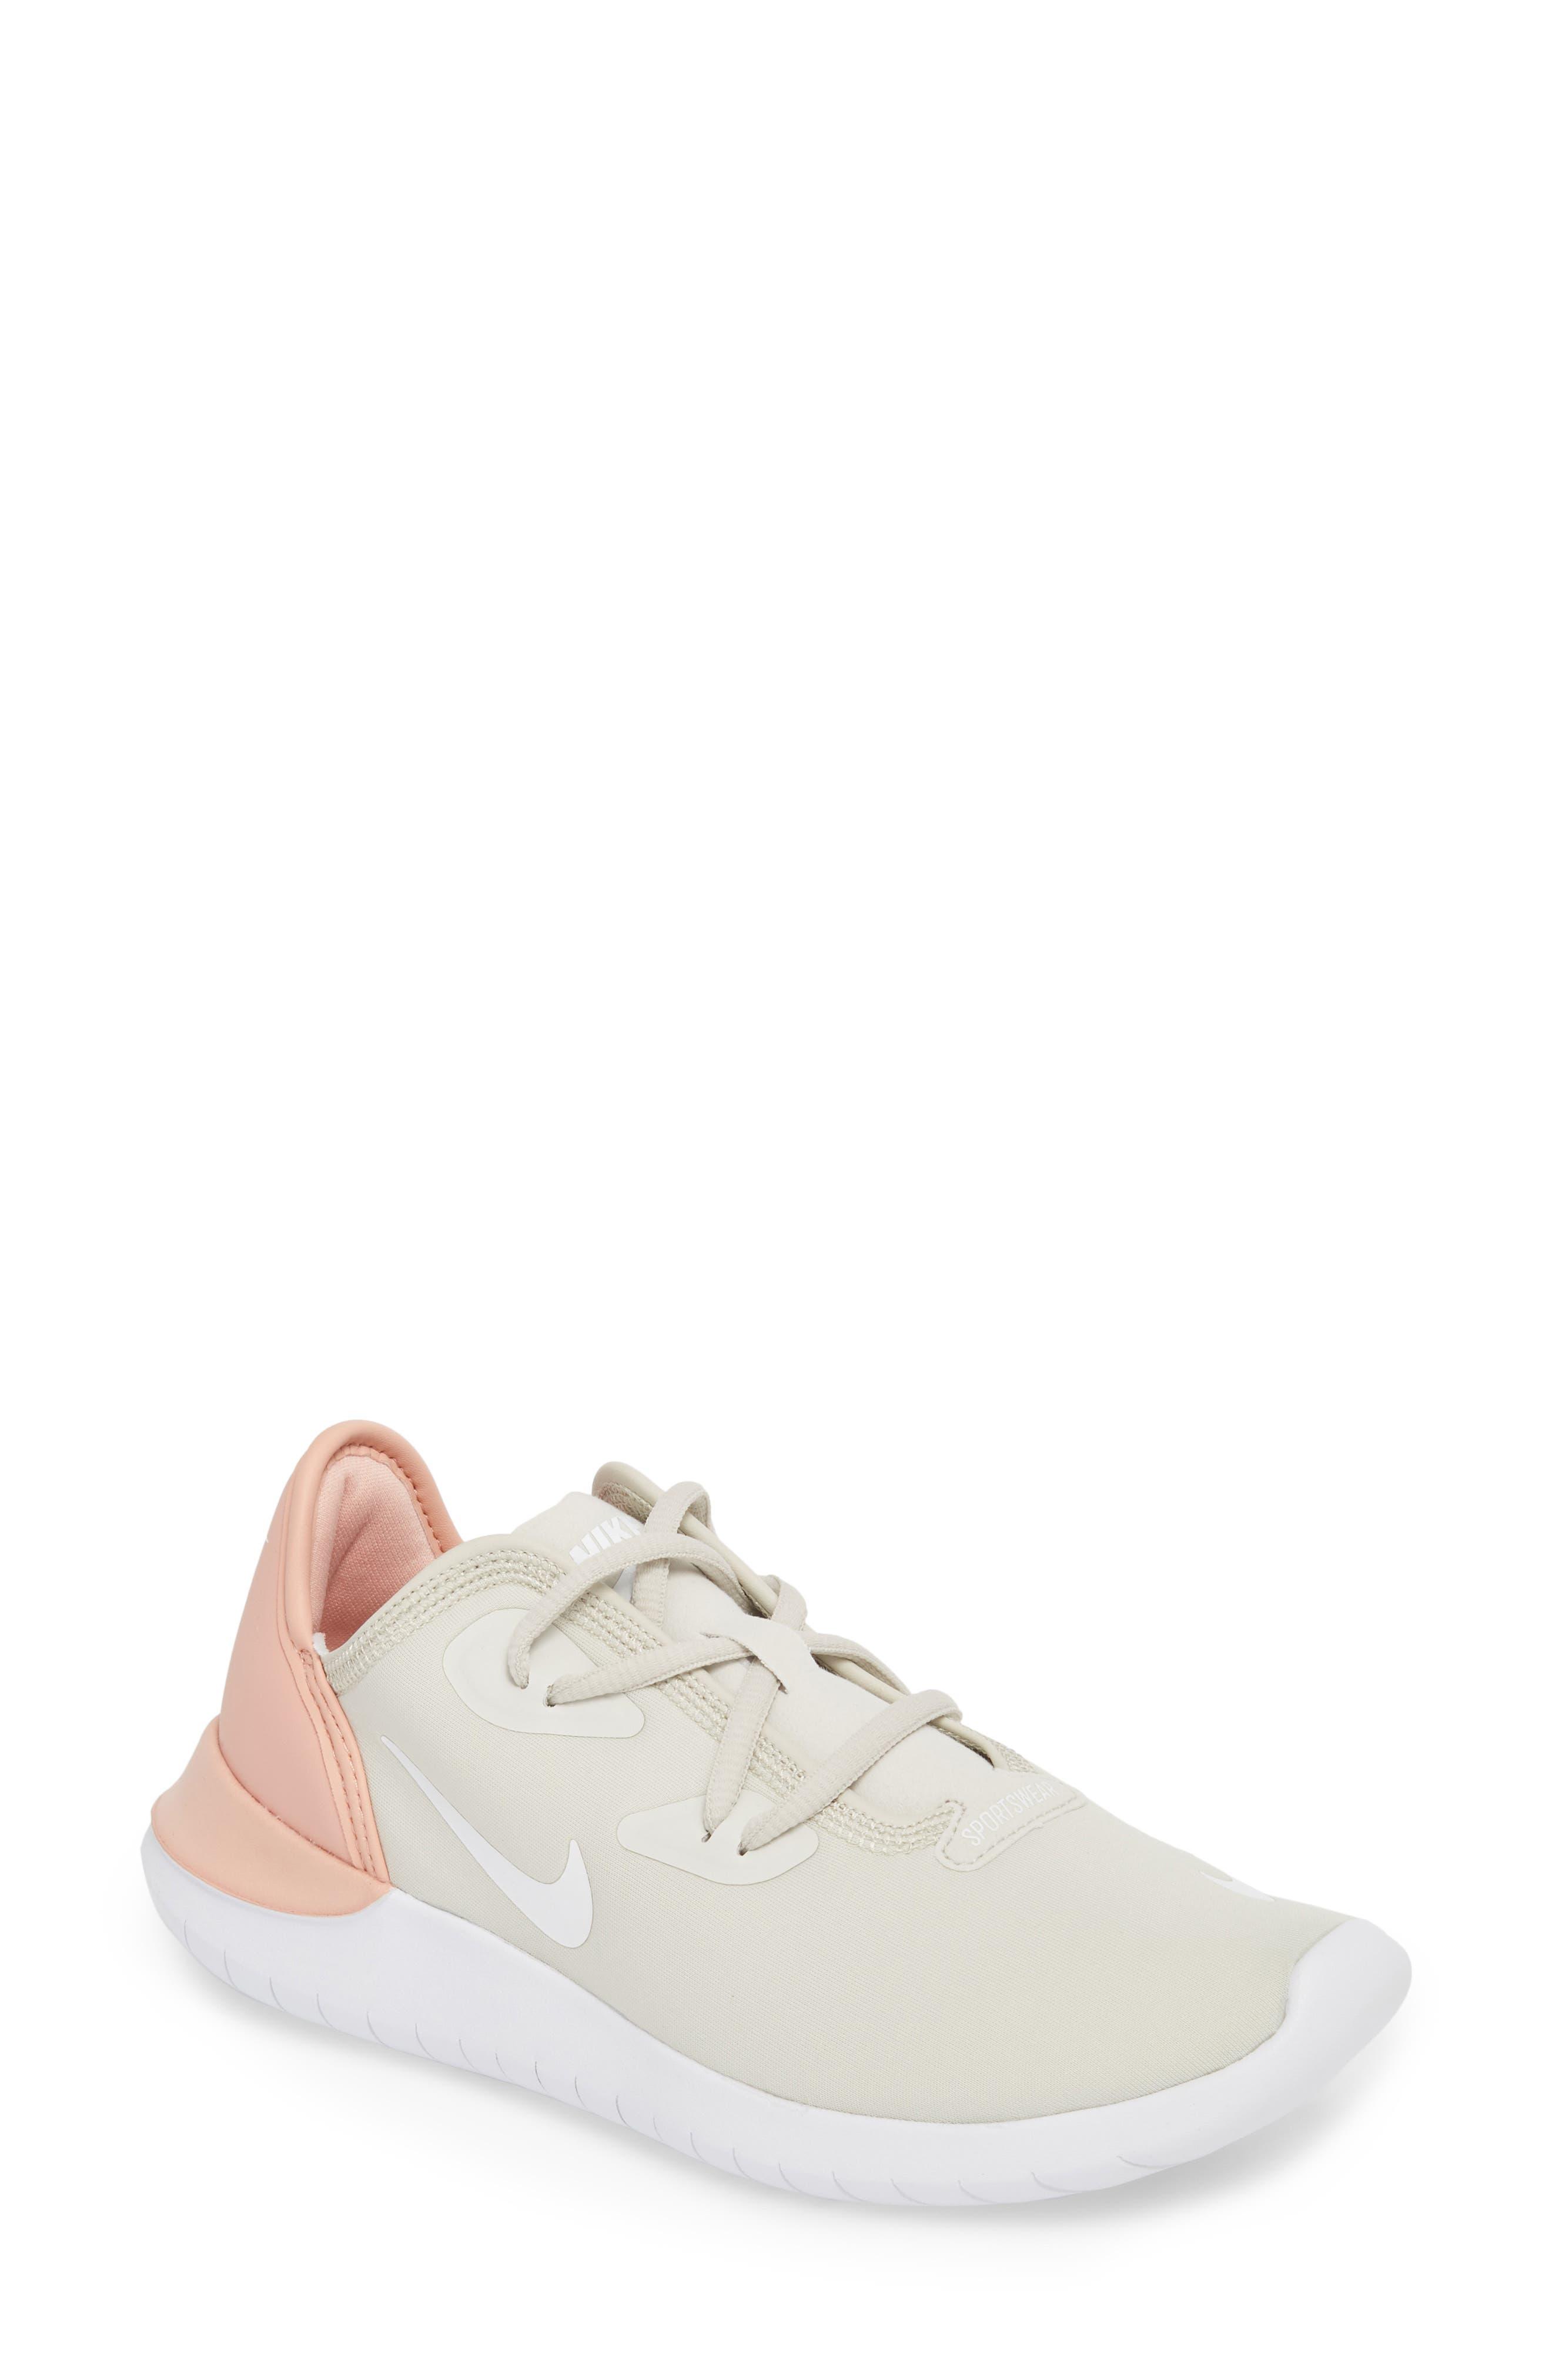 Hakata Sneaker,                             Main thumbnail 1, color,                             Light Bone/ White/ Coral